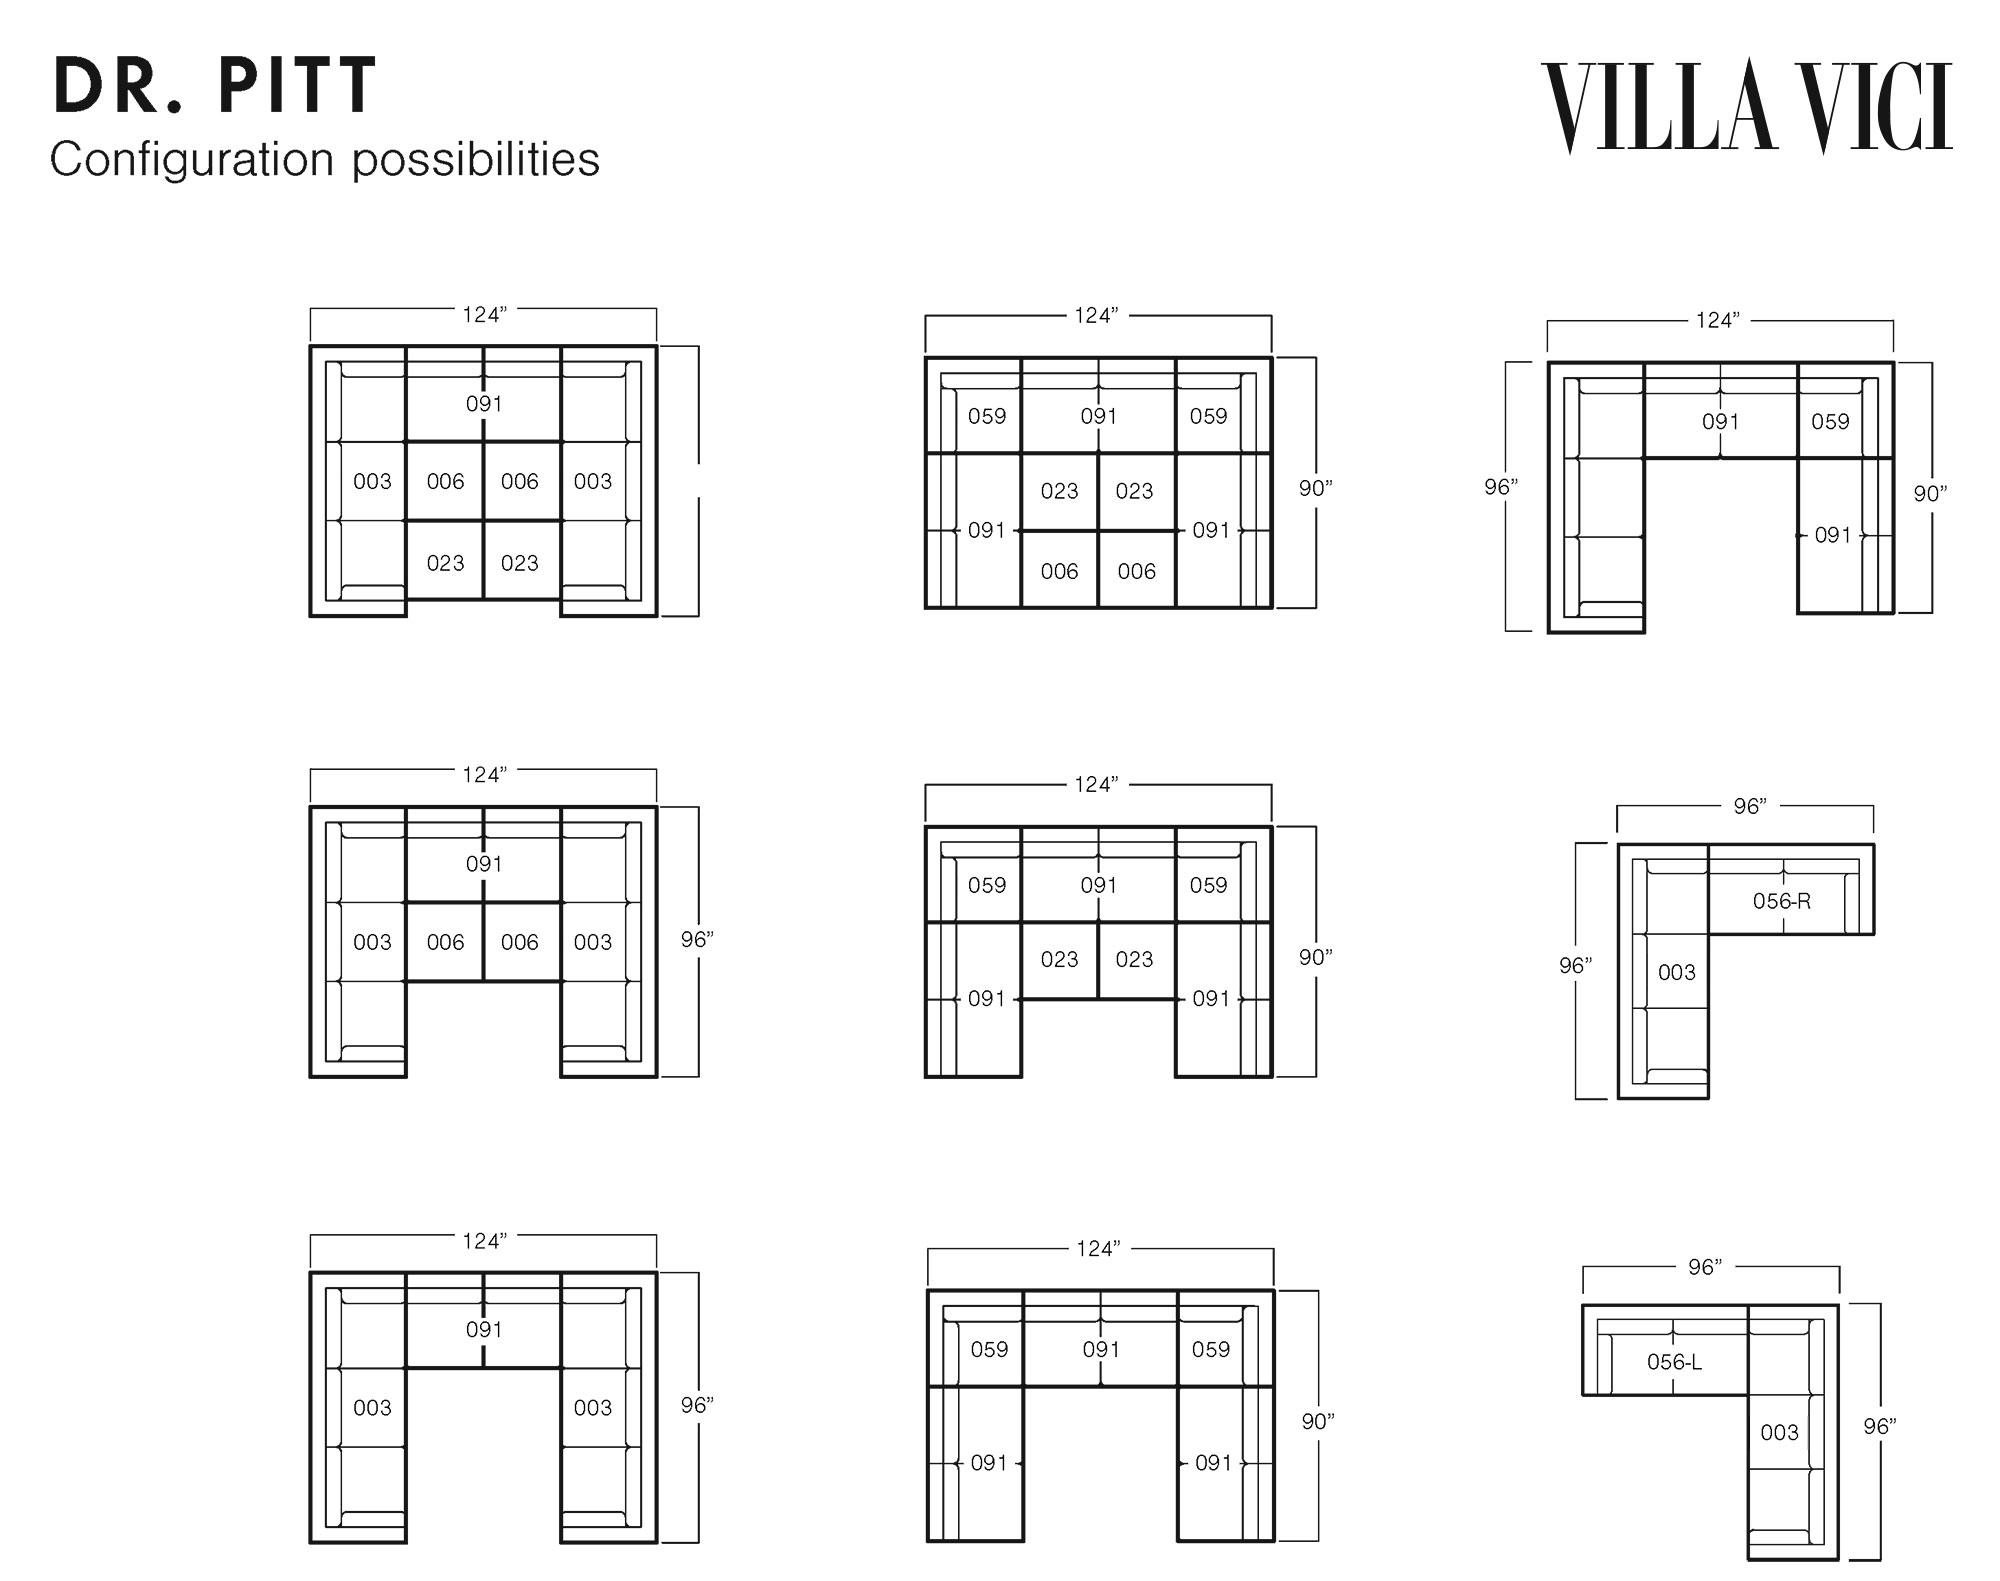 Dr.Pitt_configurations_2019